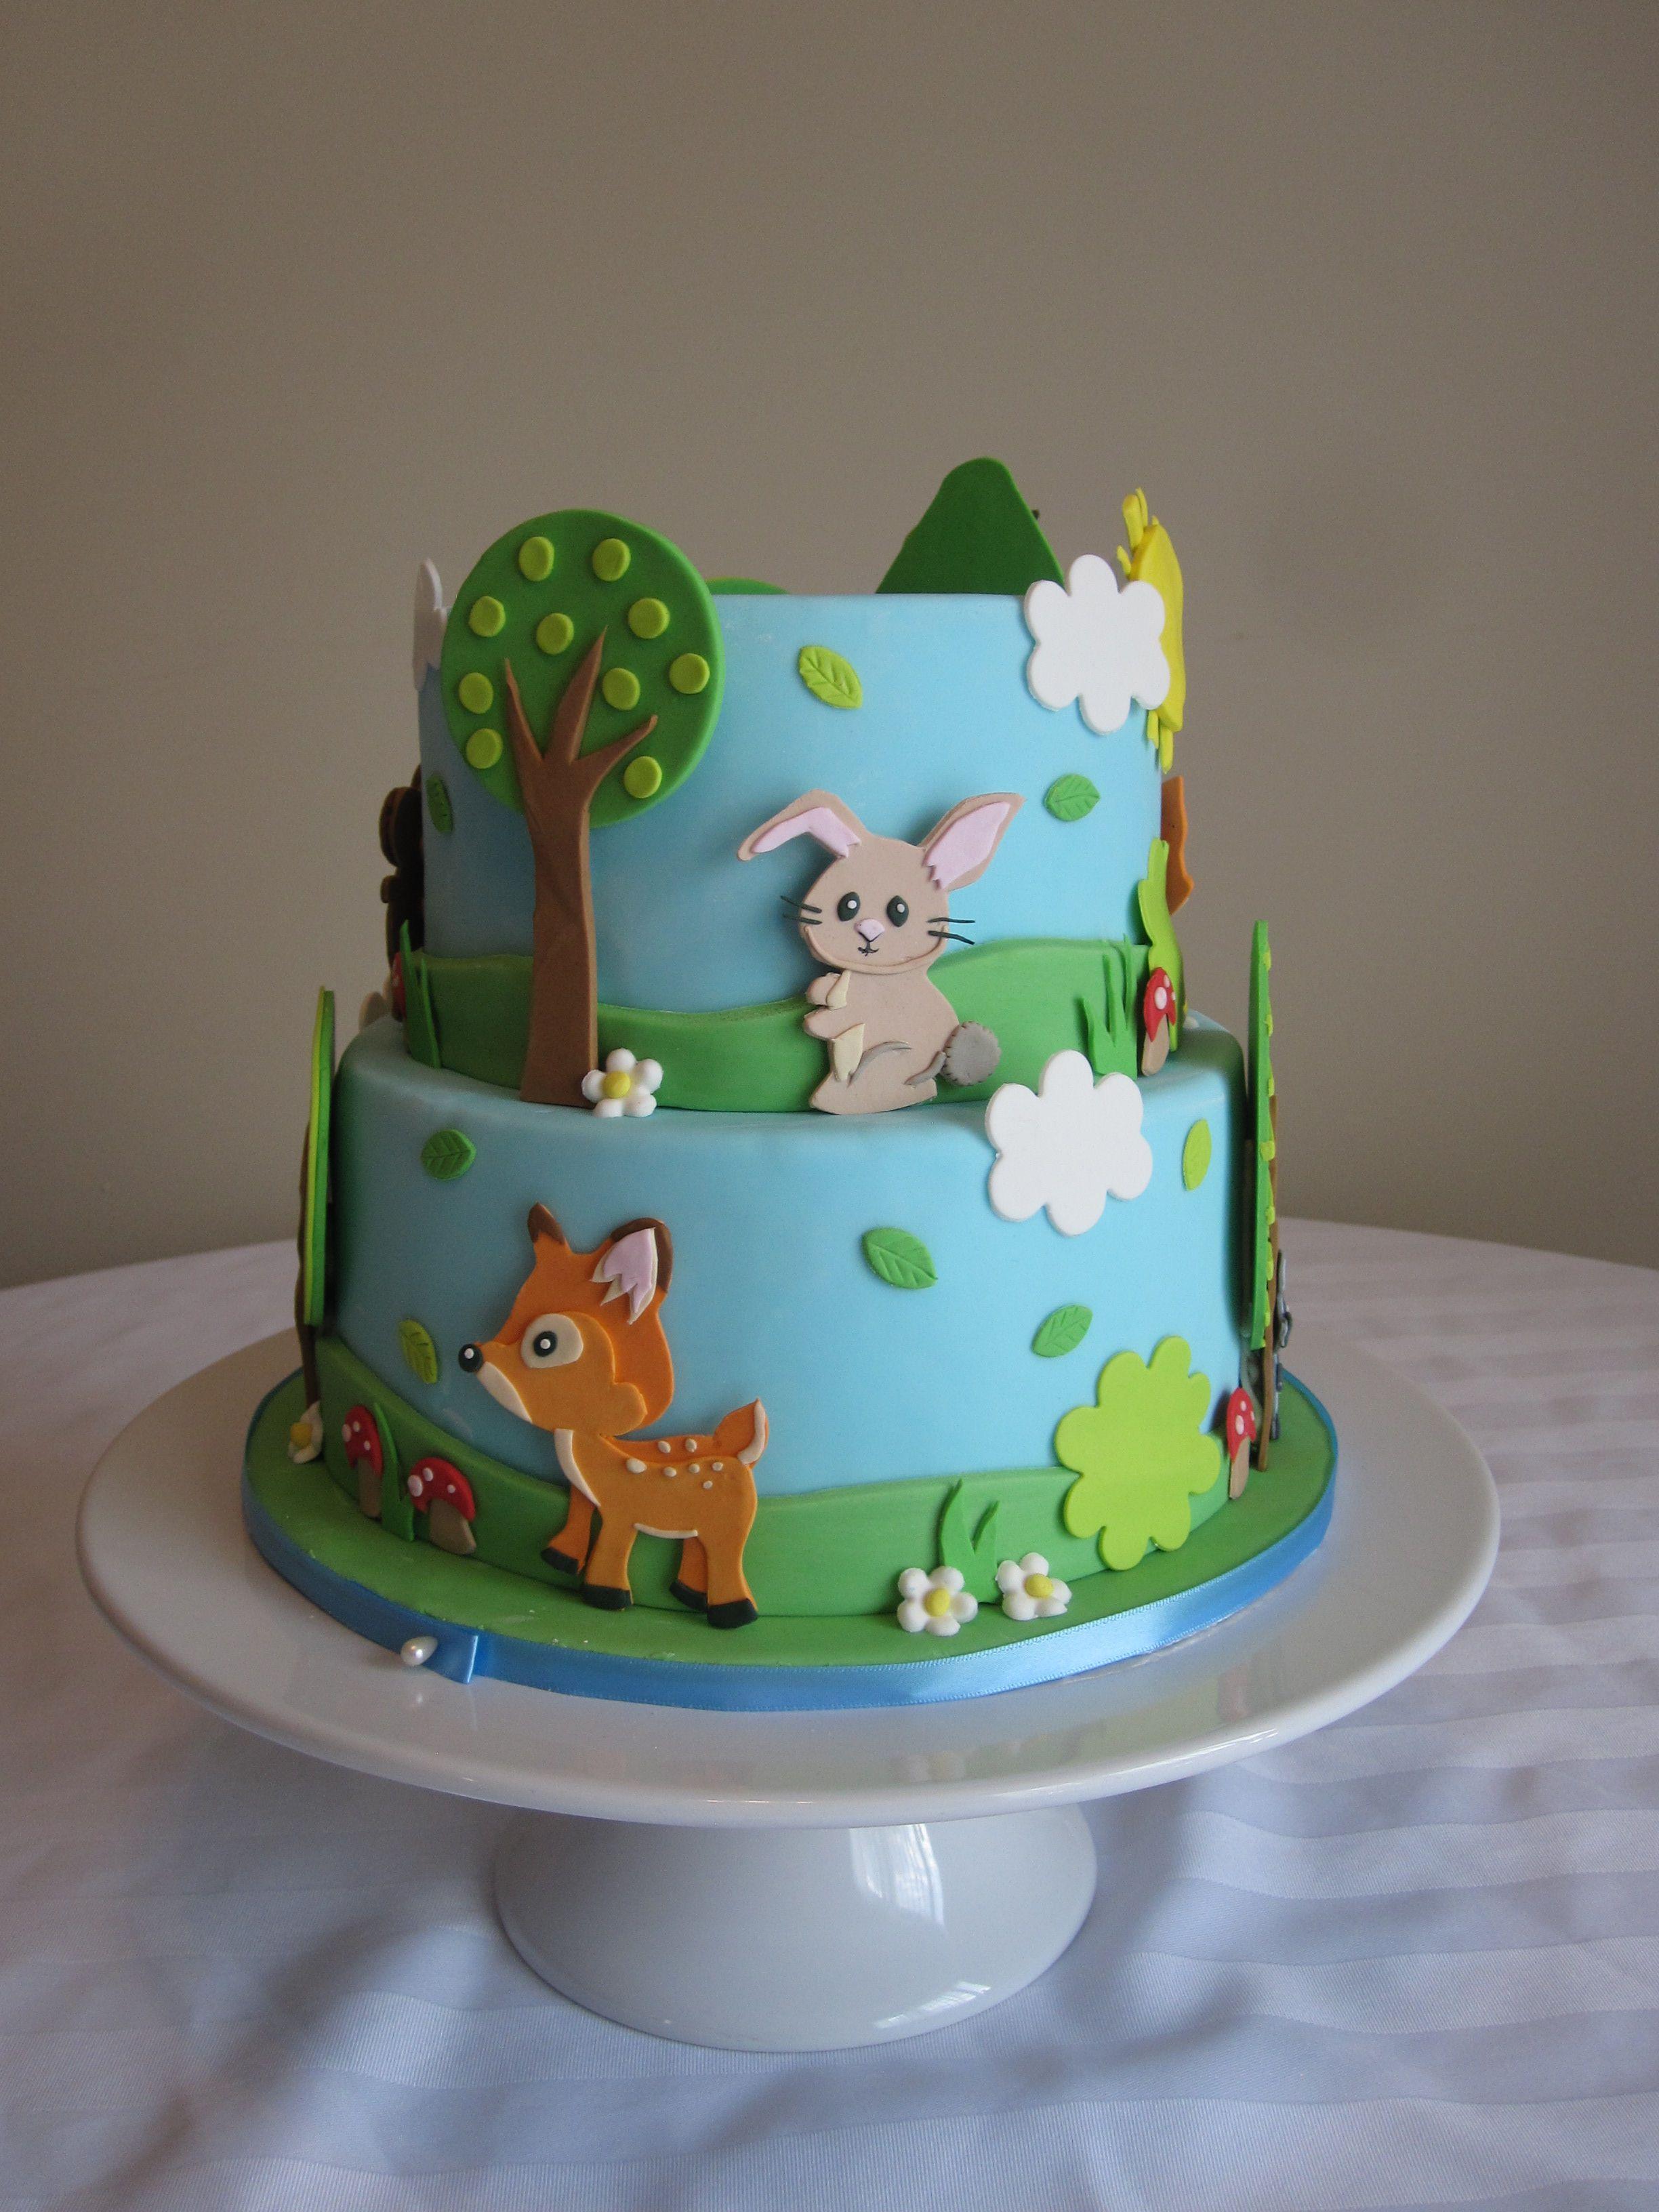 Forest animal cake cakes pinterest animal cakes for Animal cake decoration ideas